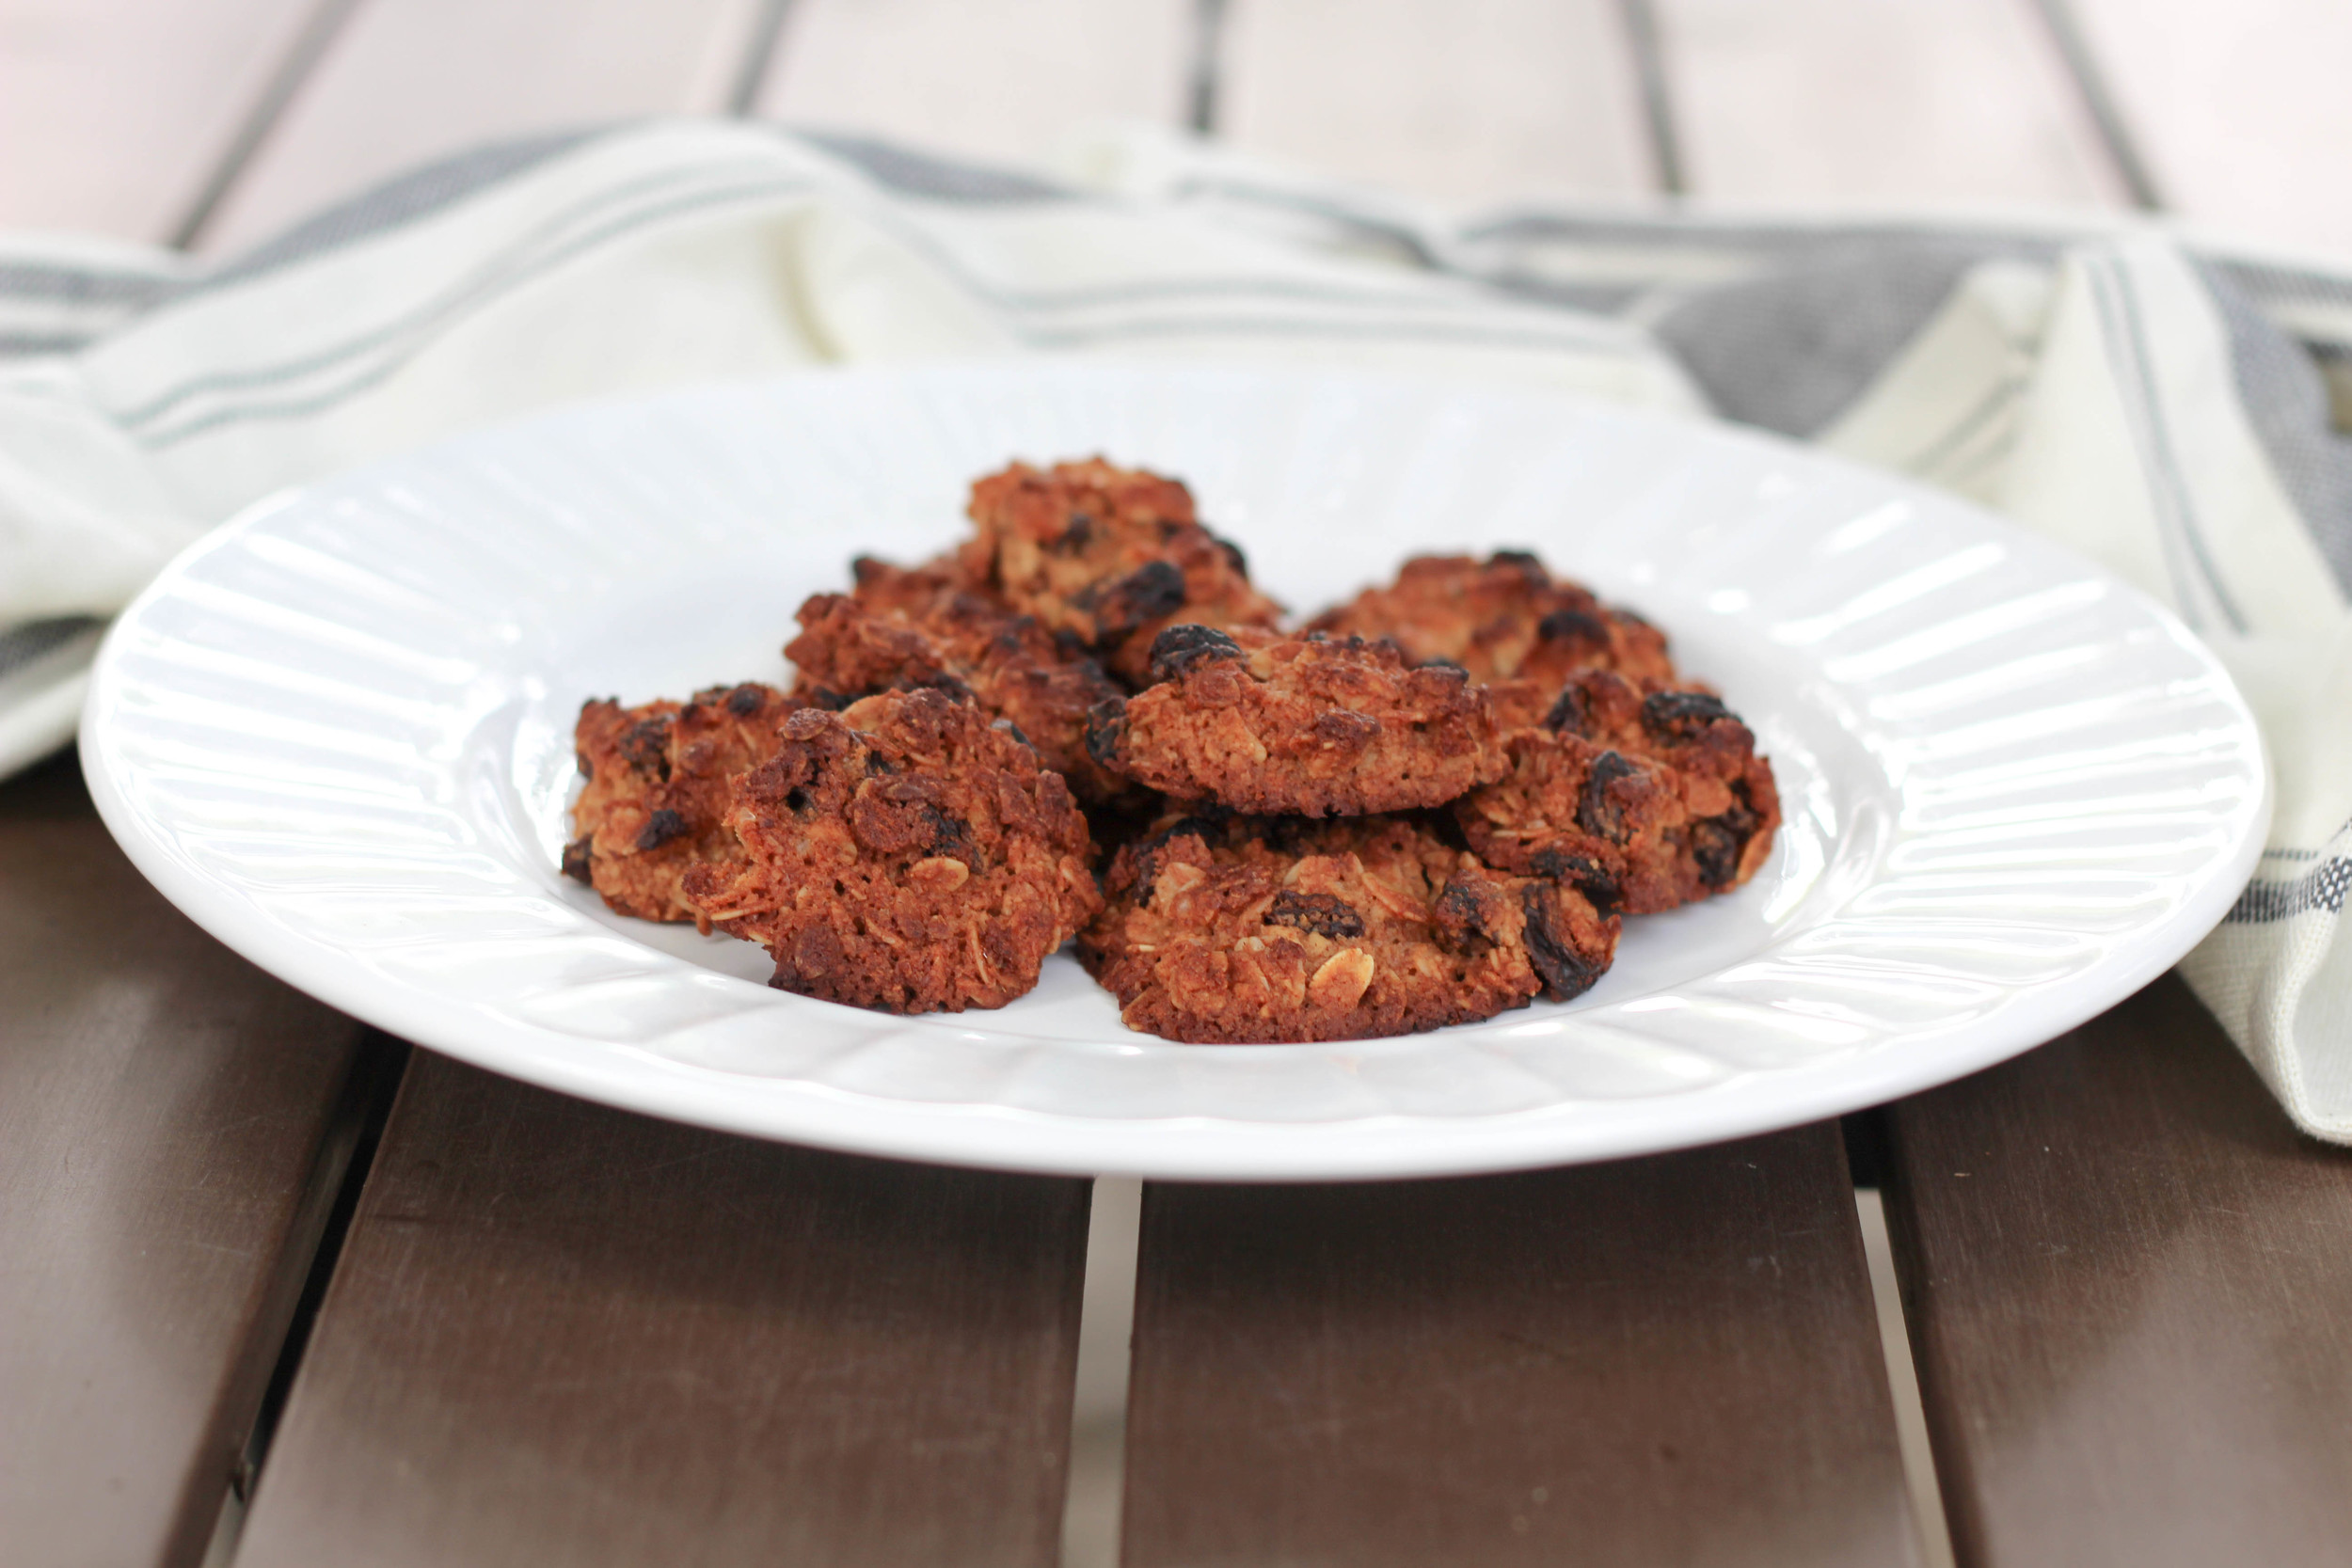 oatmeal raisin cookies, natural cookies, healthy sweet treats, cup of oats, flour, flax seed, cinnamon, coconut oil, agave, raisins, oatmeal recipe, how to make oatmeal raisin cookies,